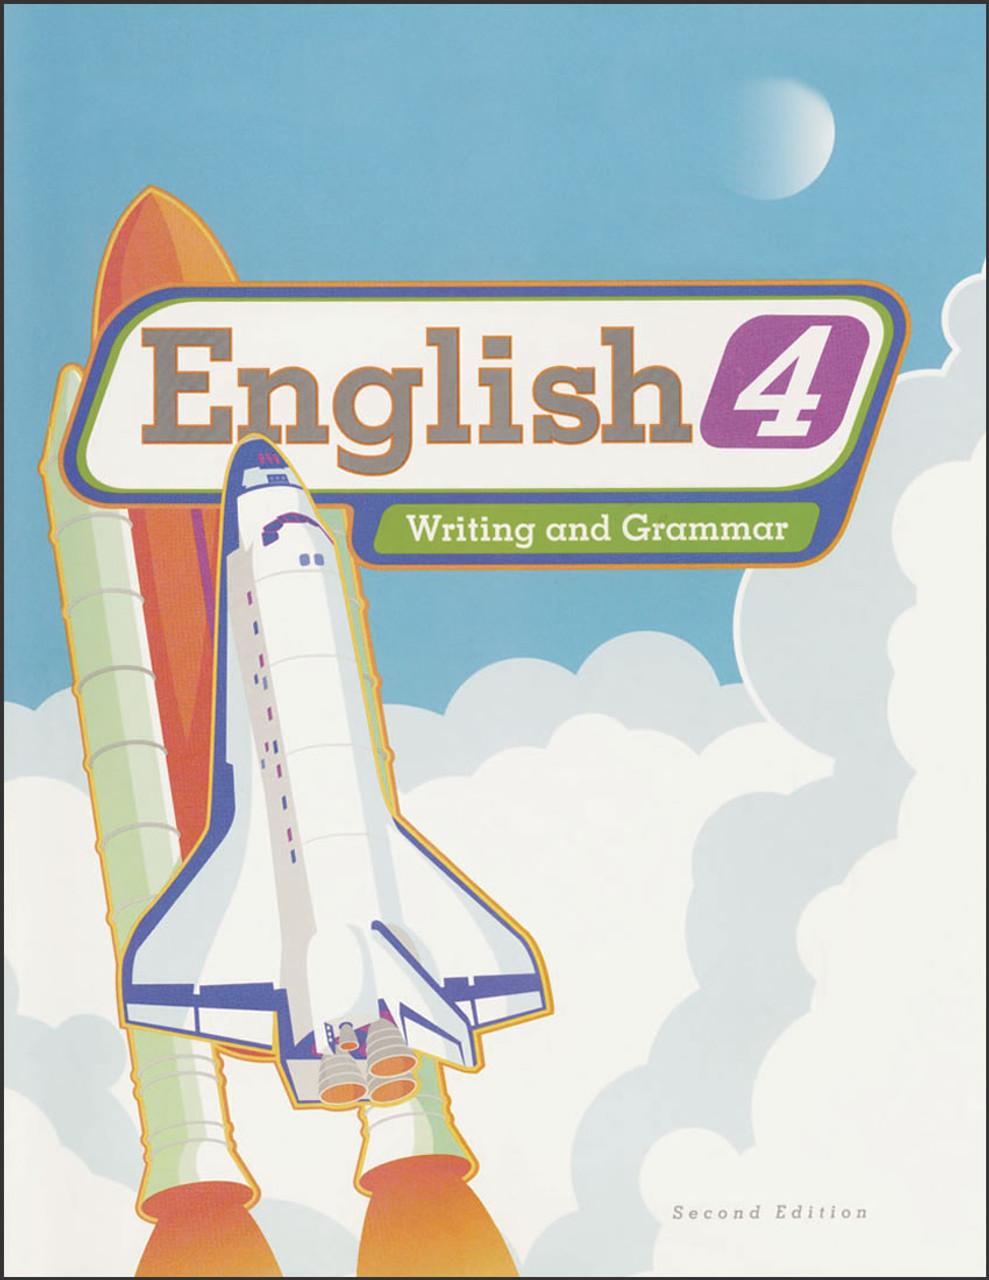 English 4, 2nd edition